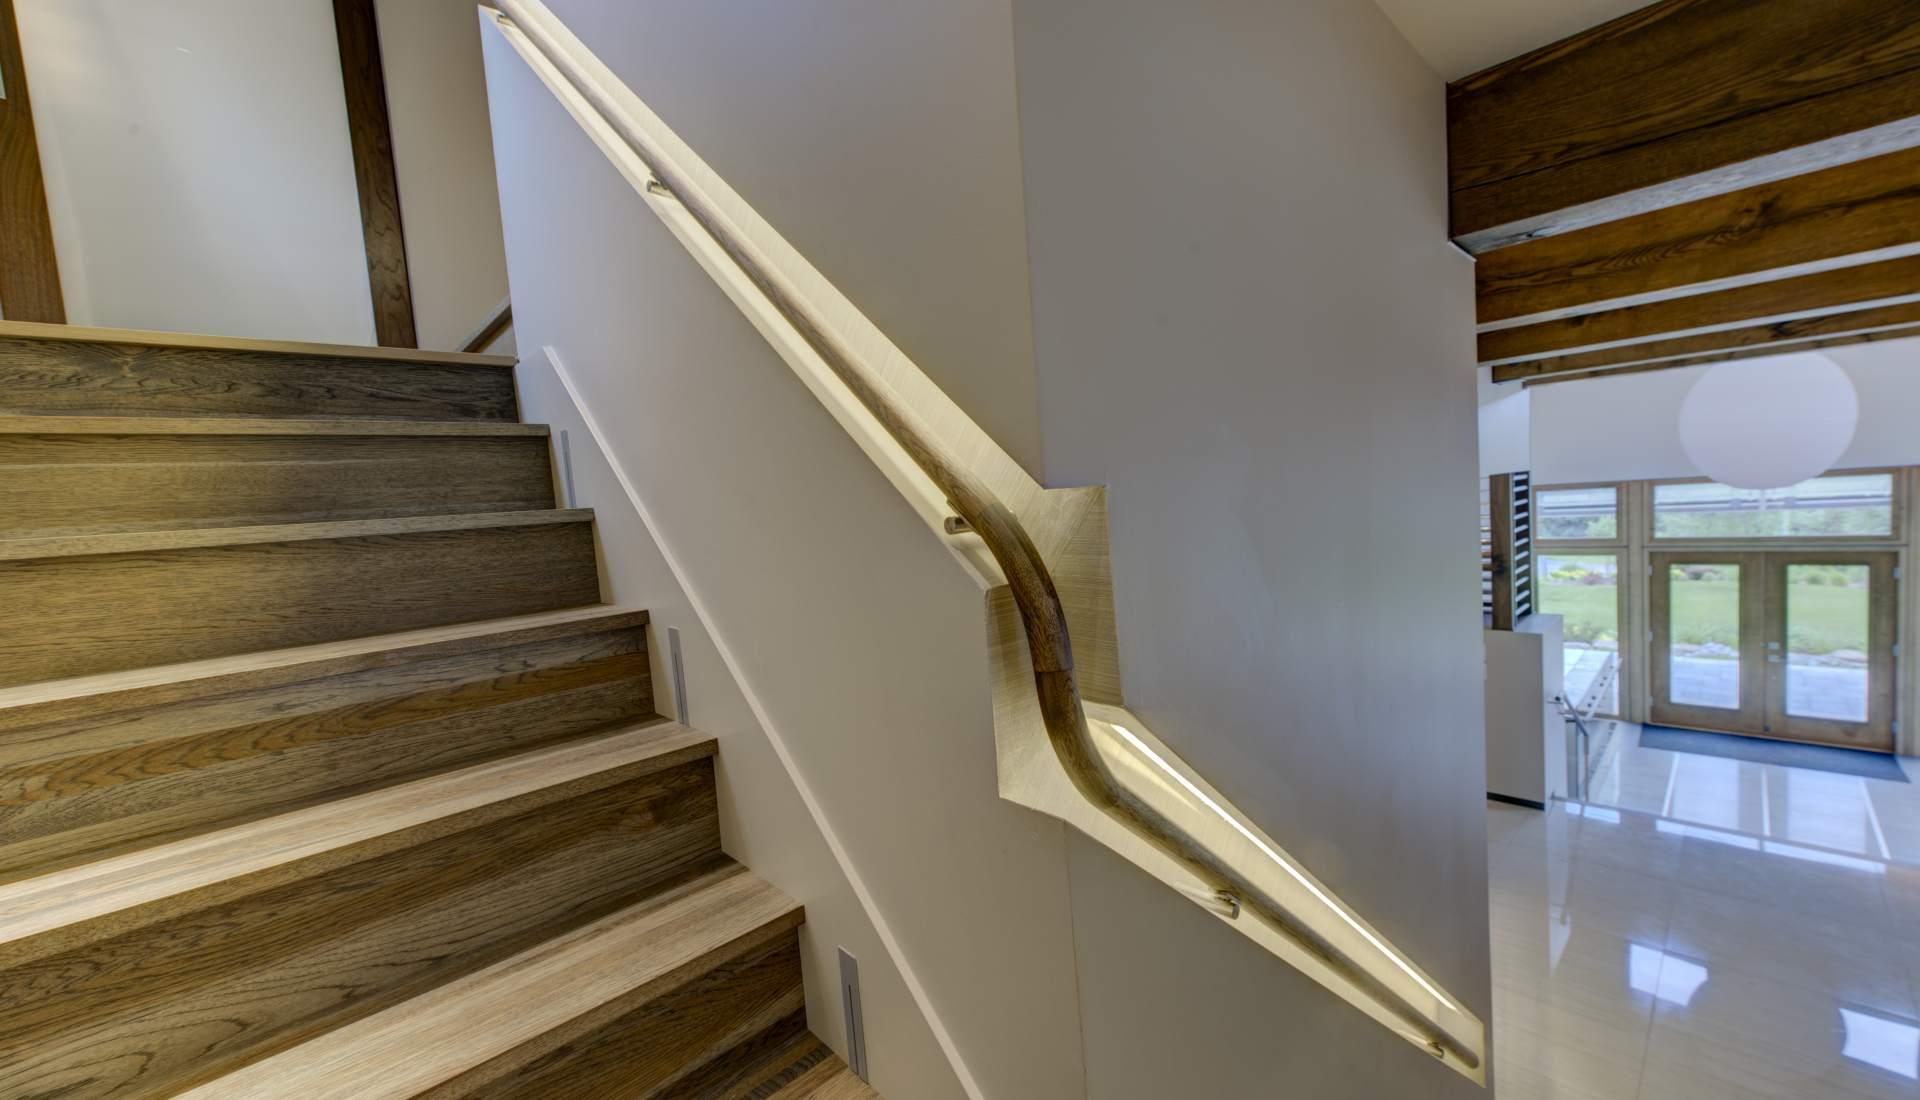 david gilbert escaliers 100 bois photos. Black Bedroom Furniture Sets. Home Design Ideas